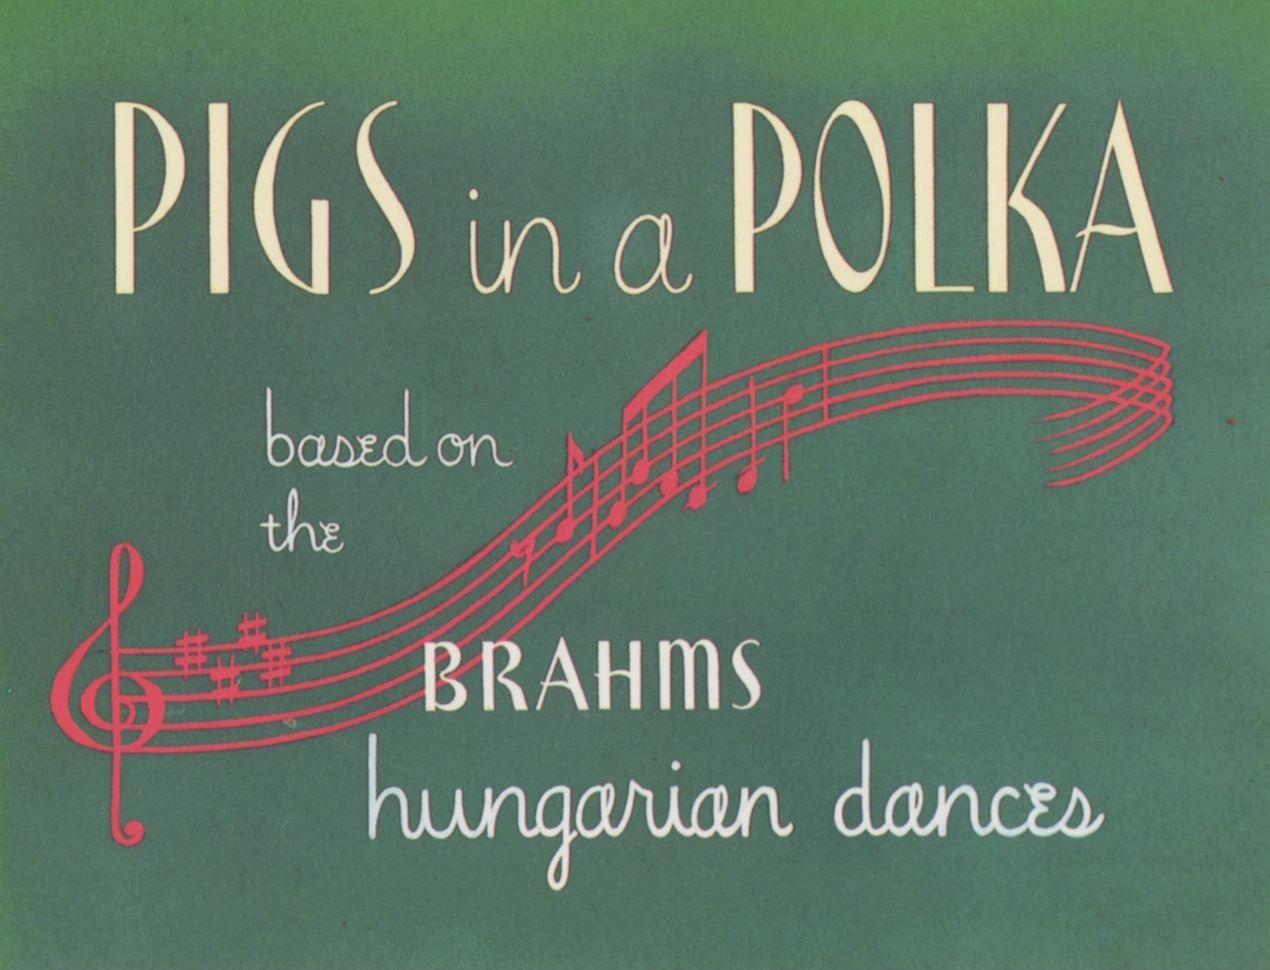 Pigs polka